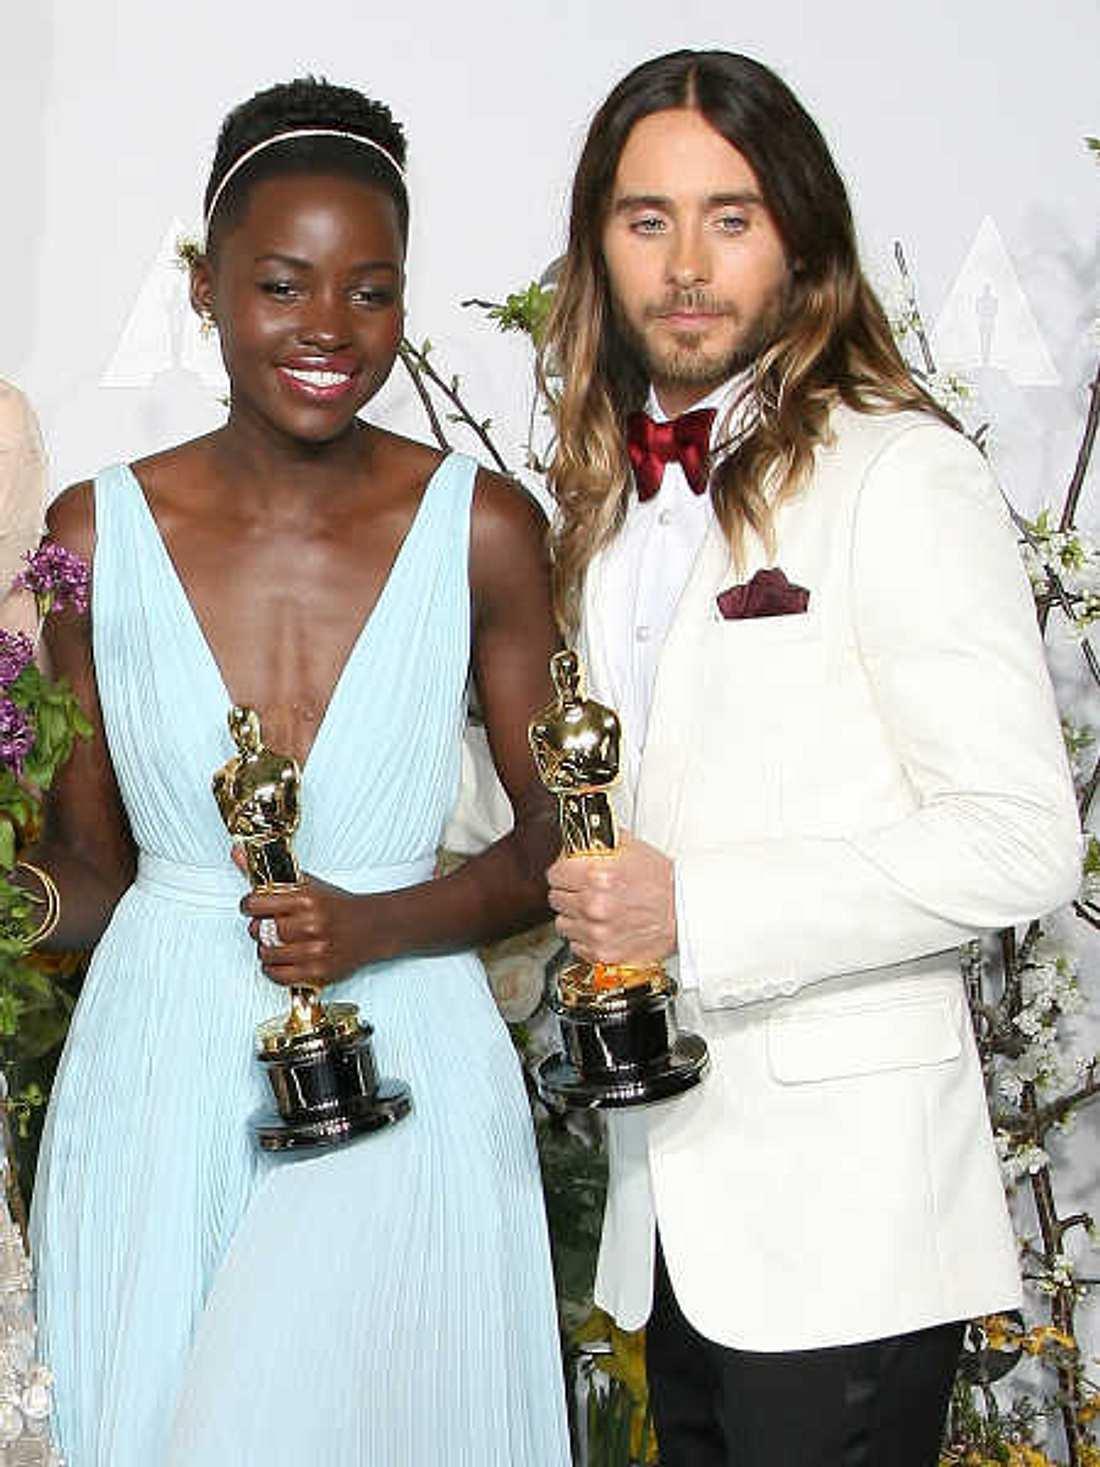 Jared Leto und Lupita Nyong'o: Beziehung bestätigt?